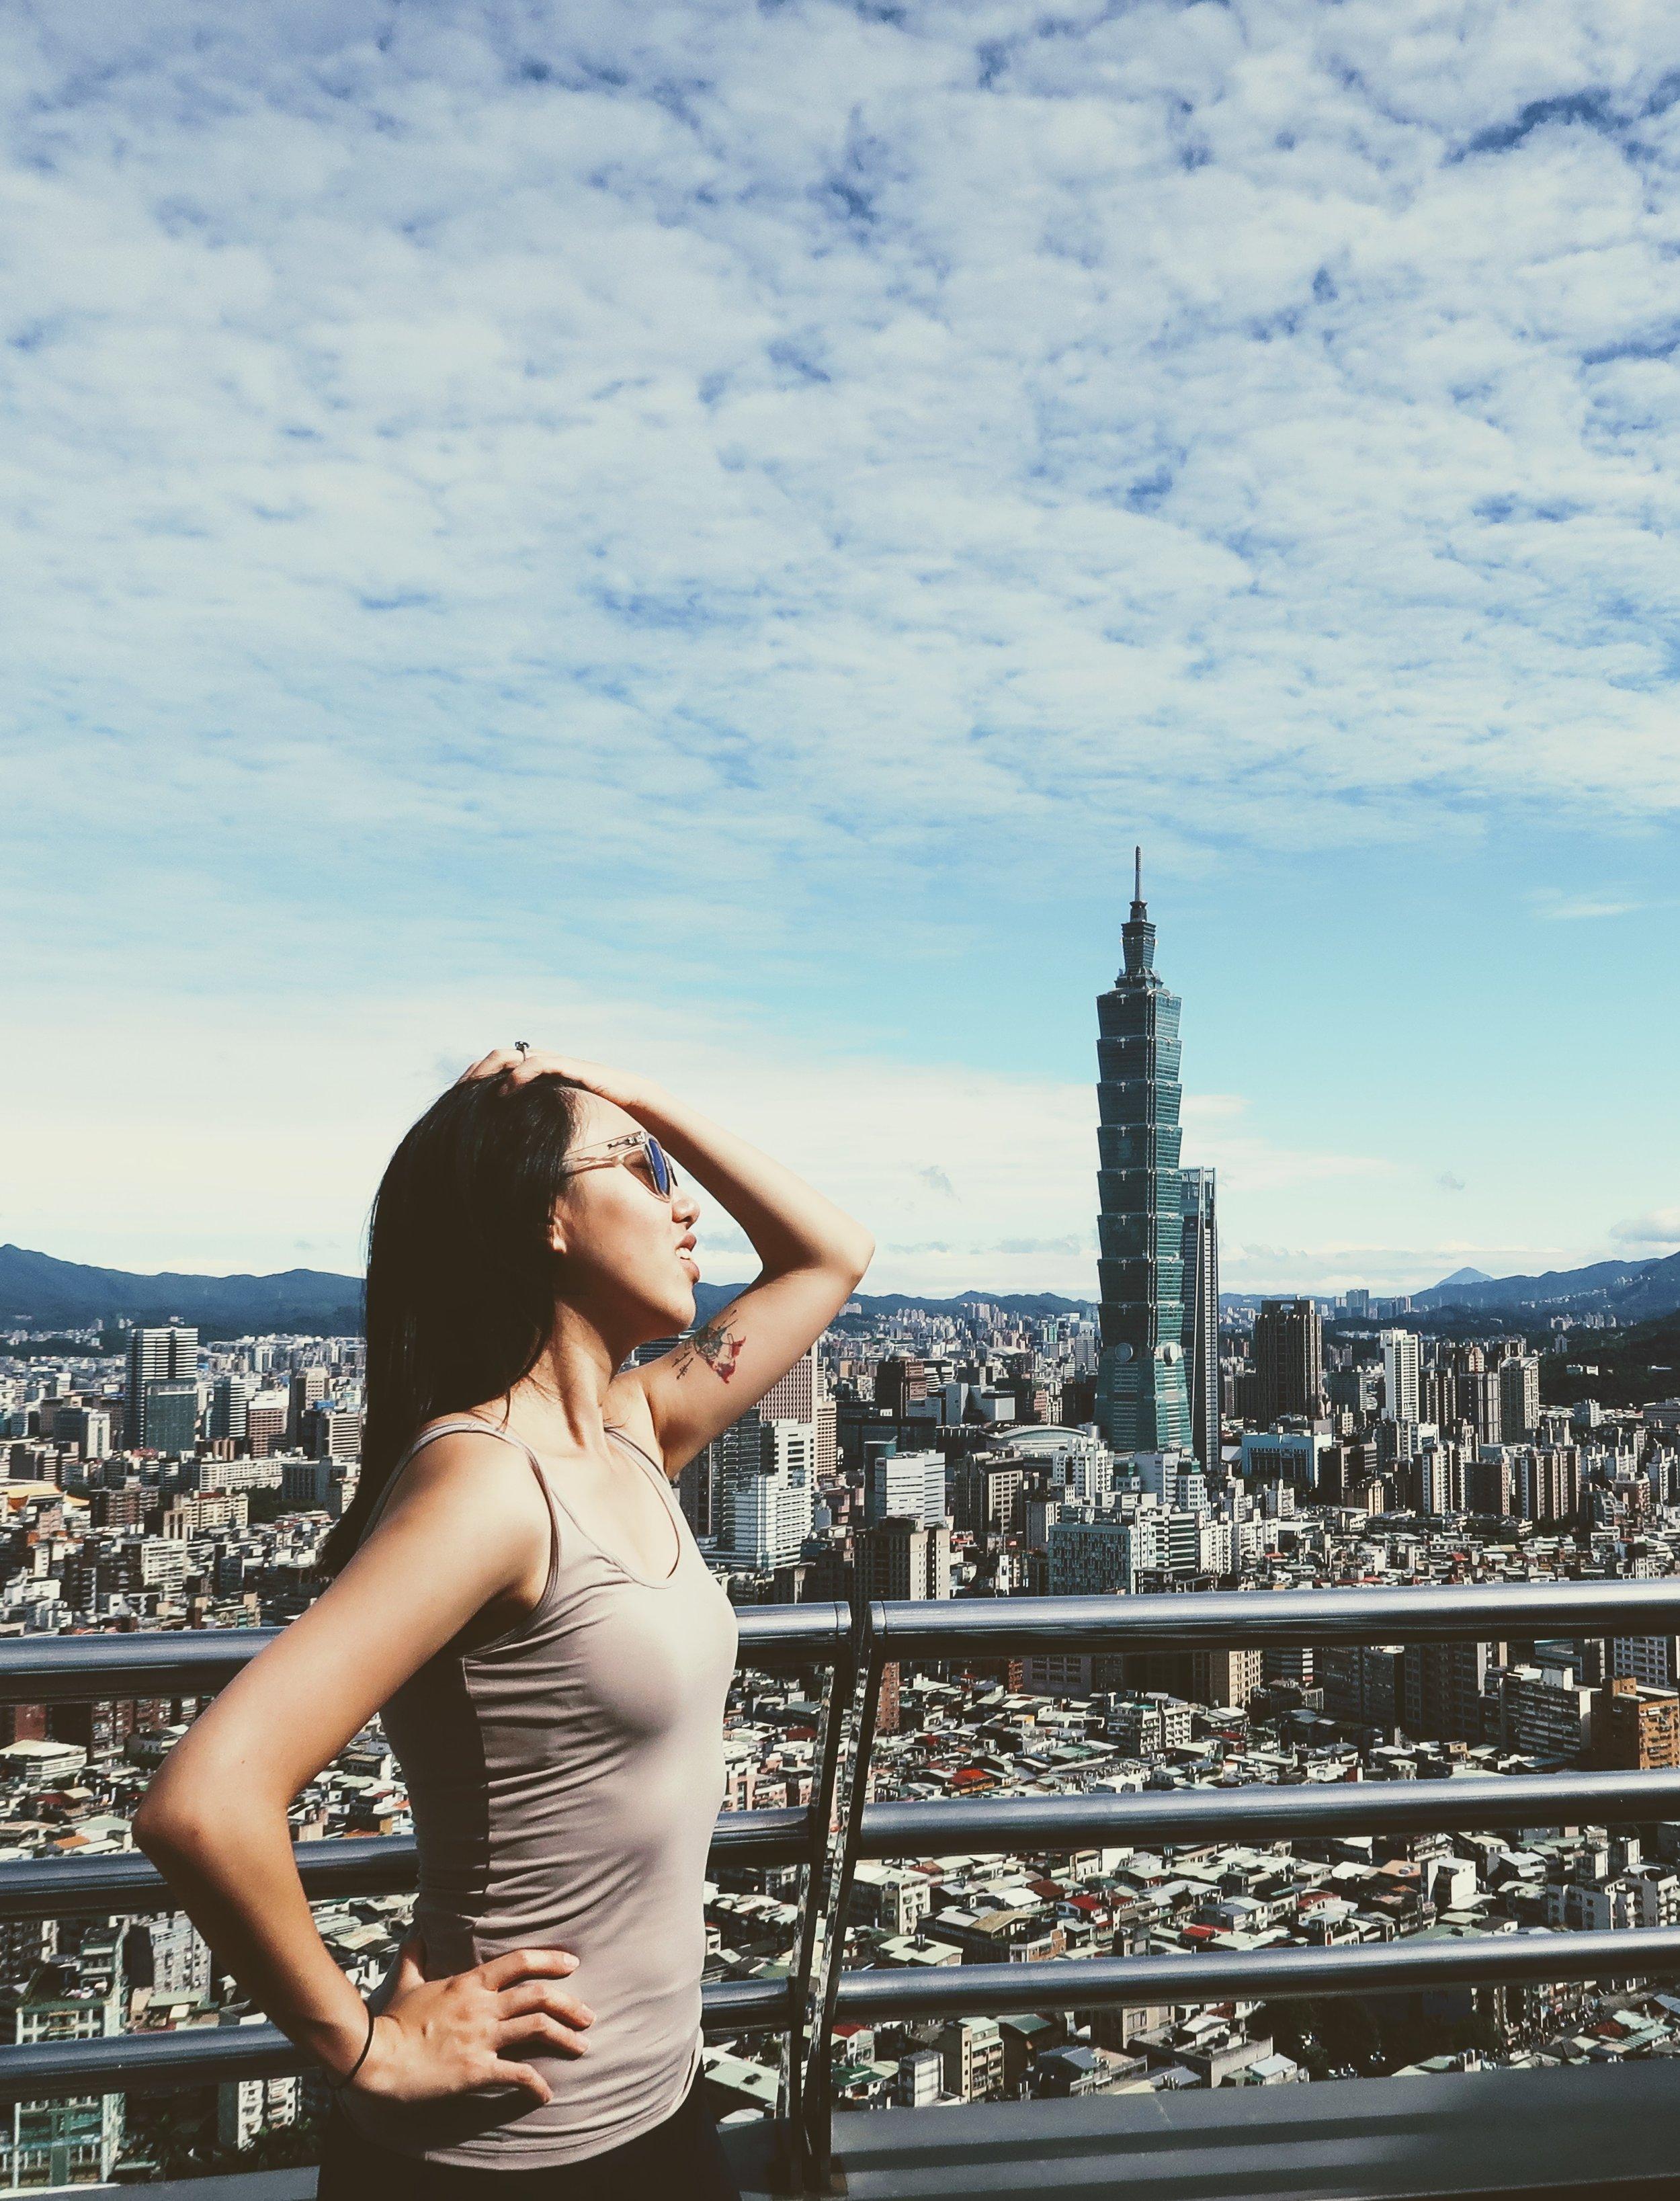 shangri-la-taipei-rooftop-morning-views